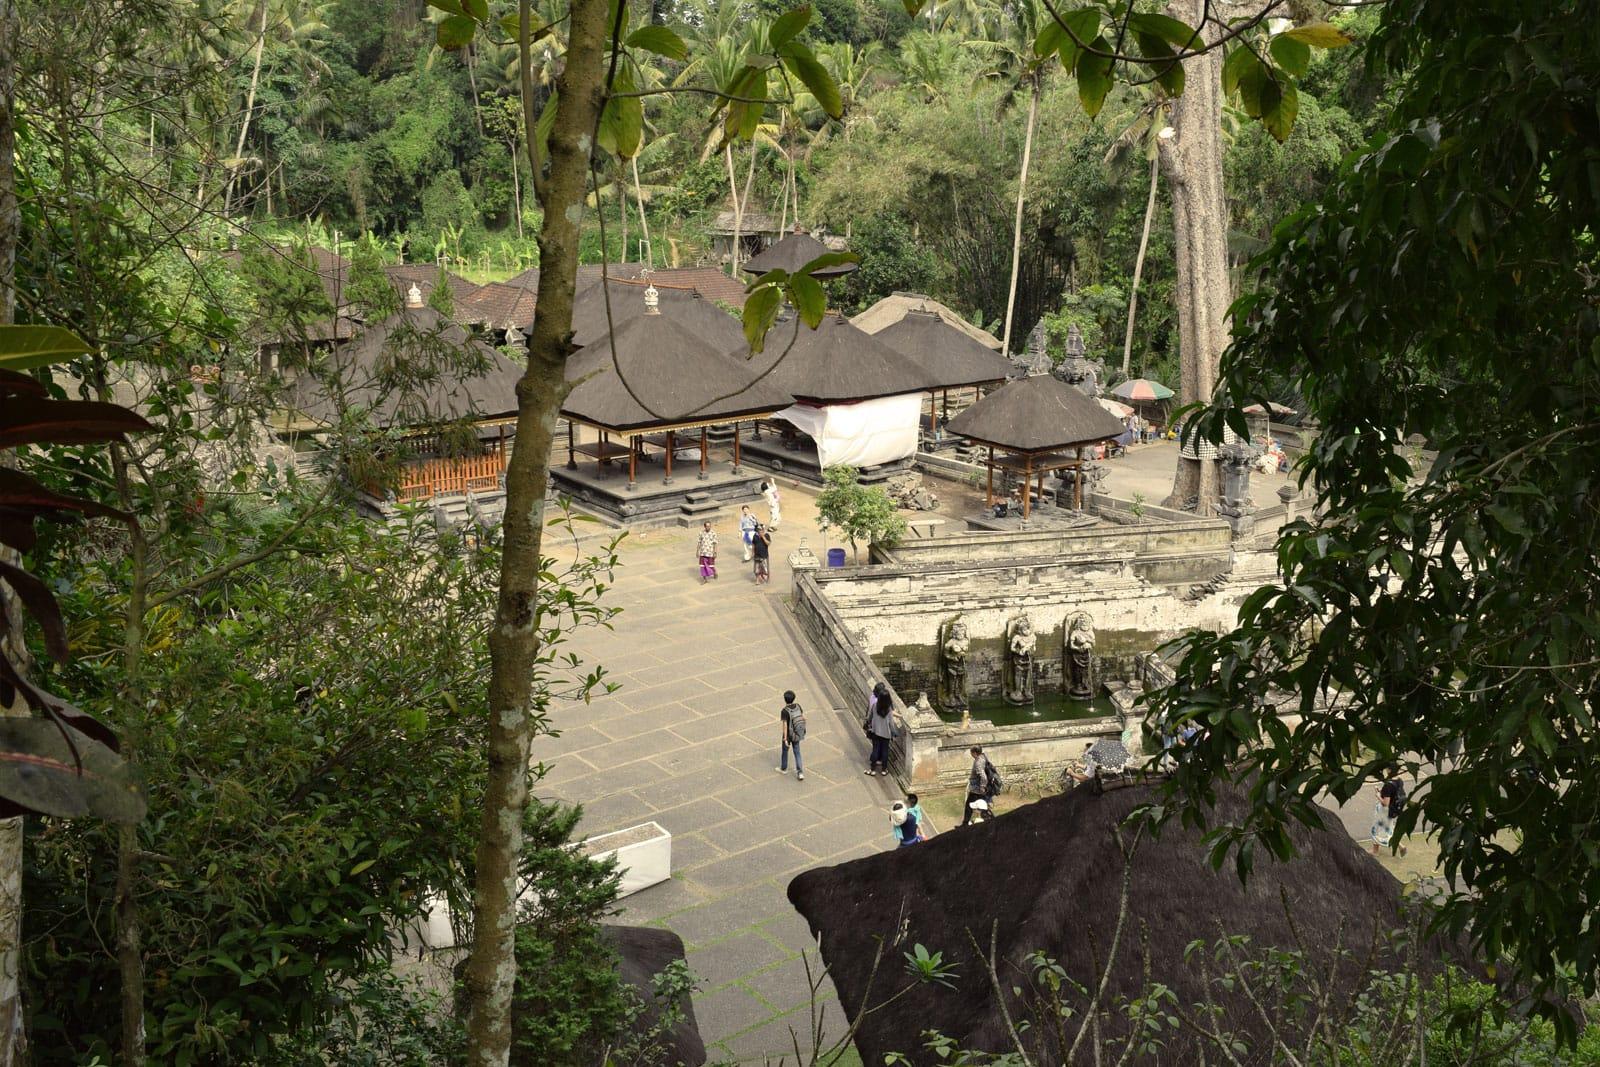 Het tempelcomplex van bovenaf